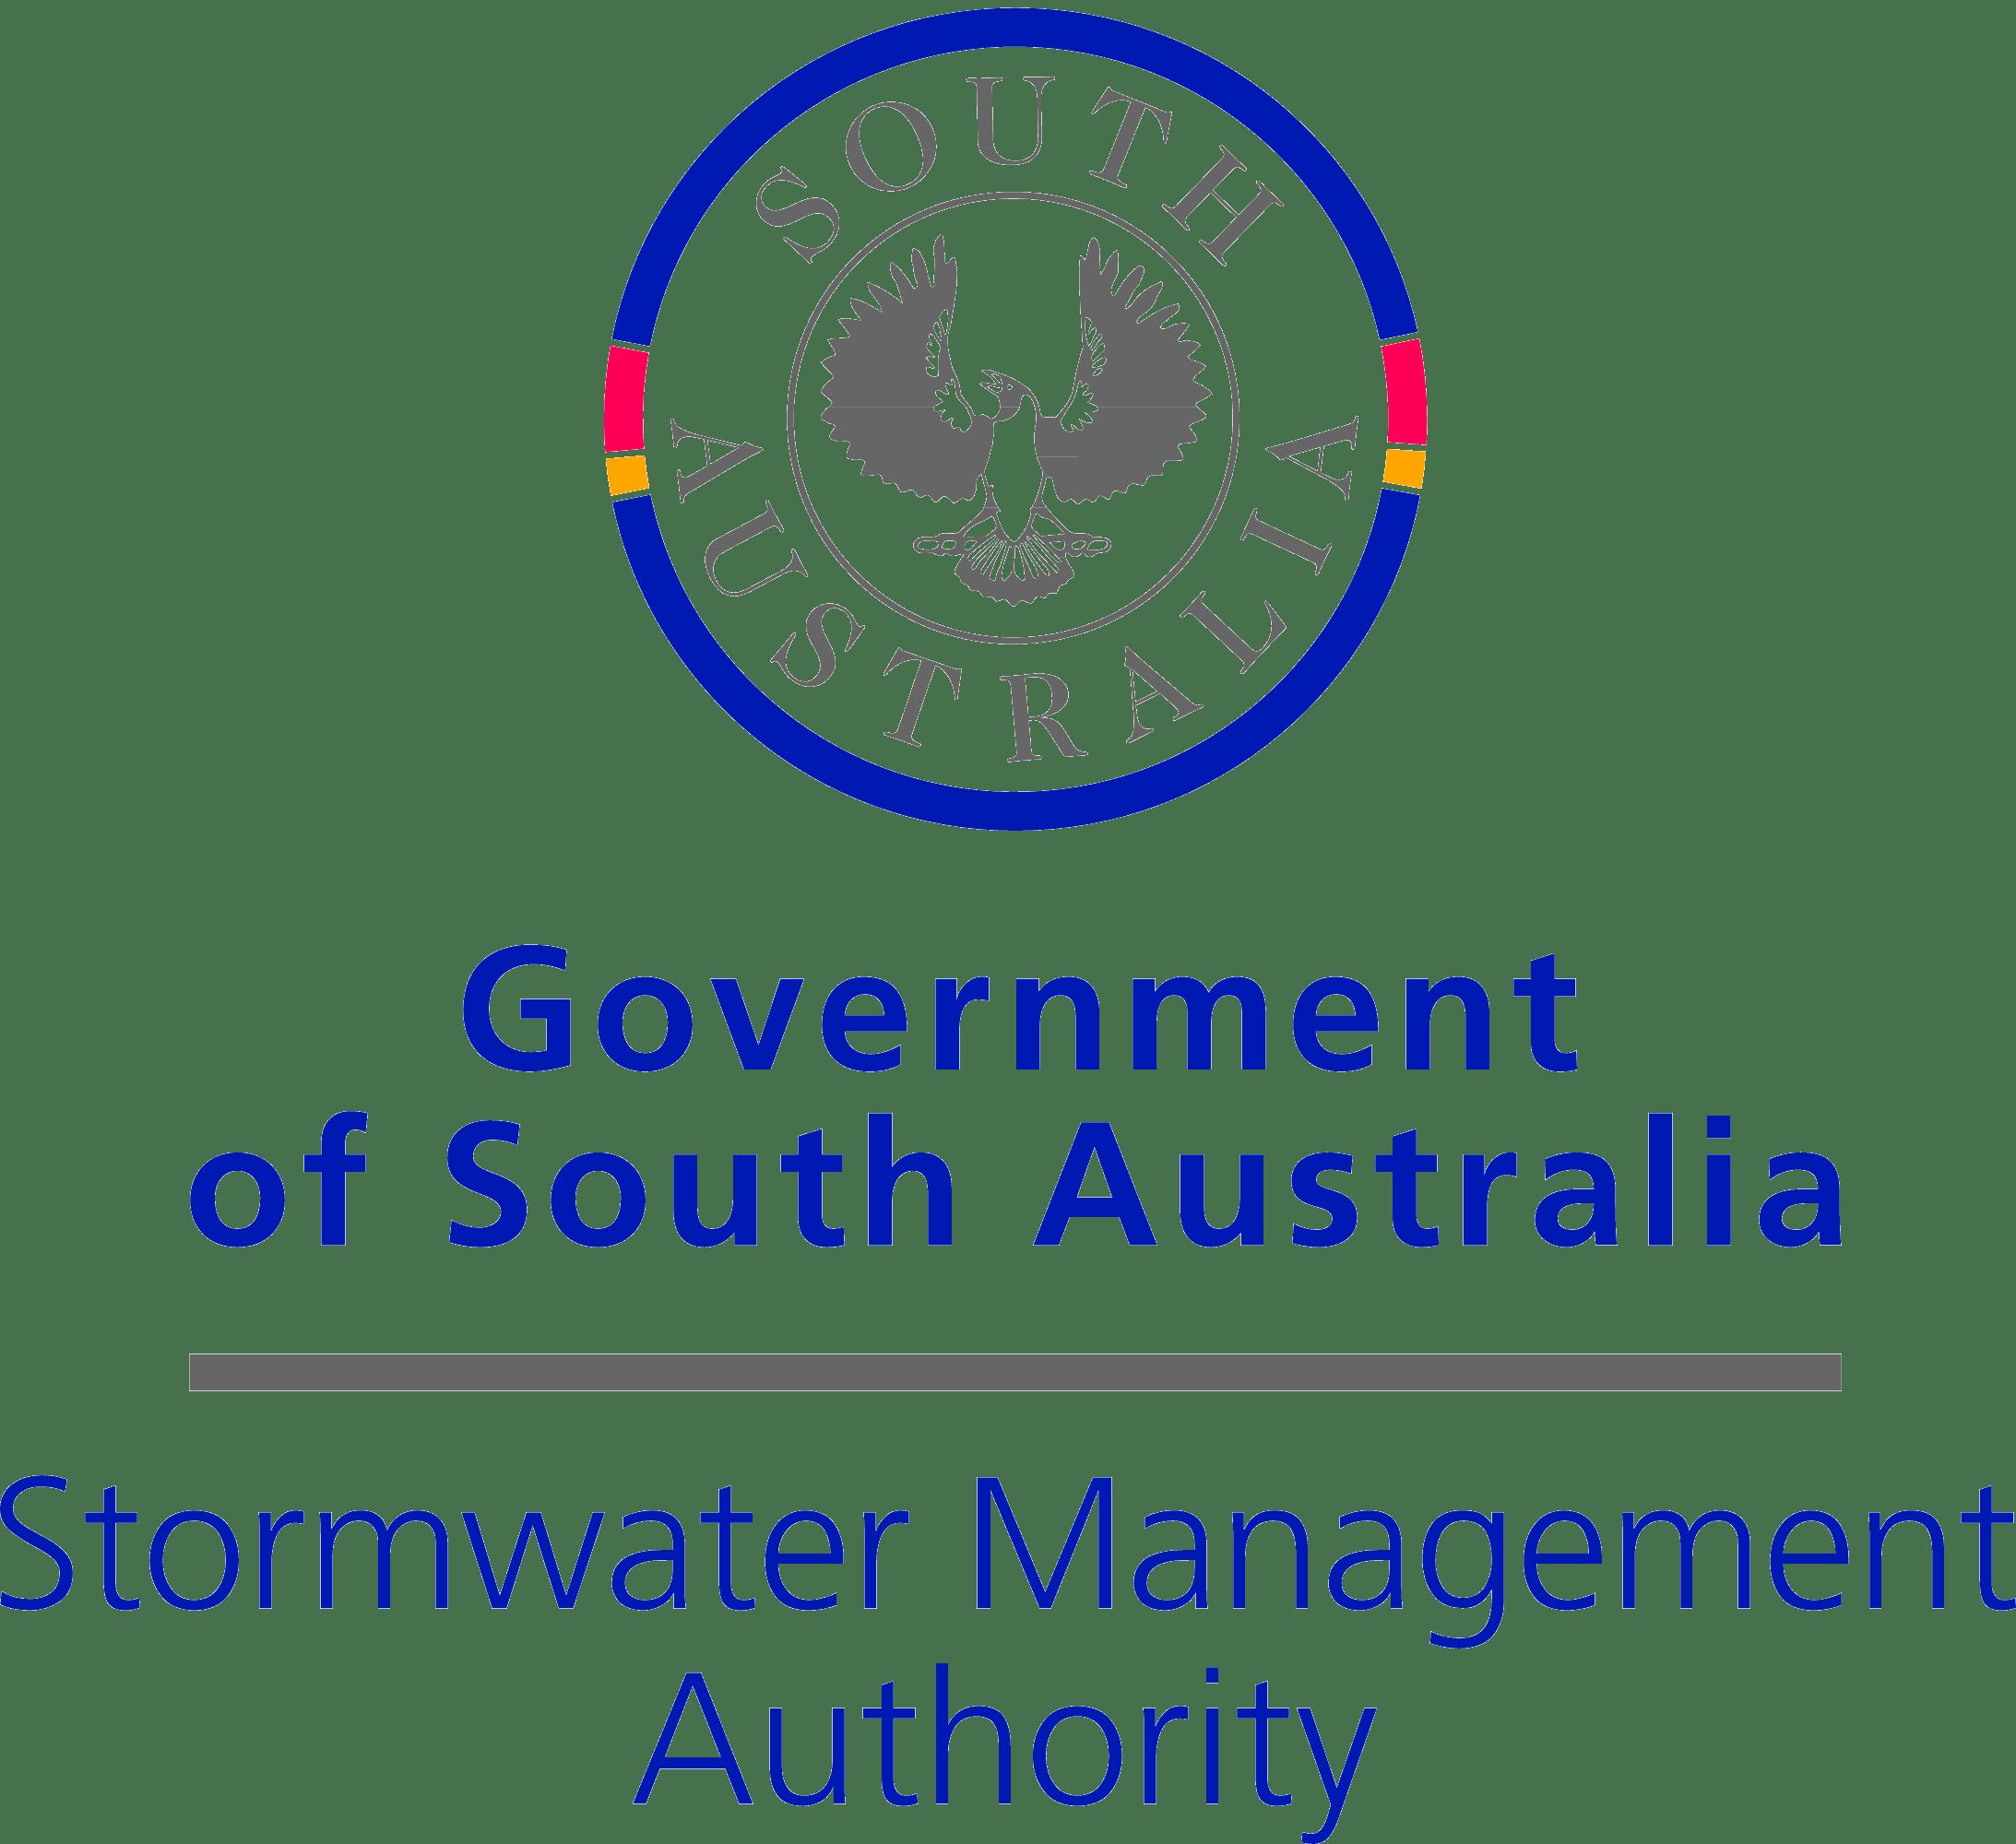 Stormwater Management Authority logo